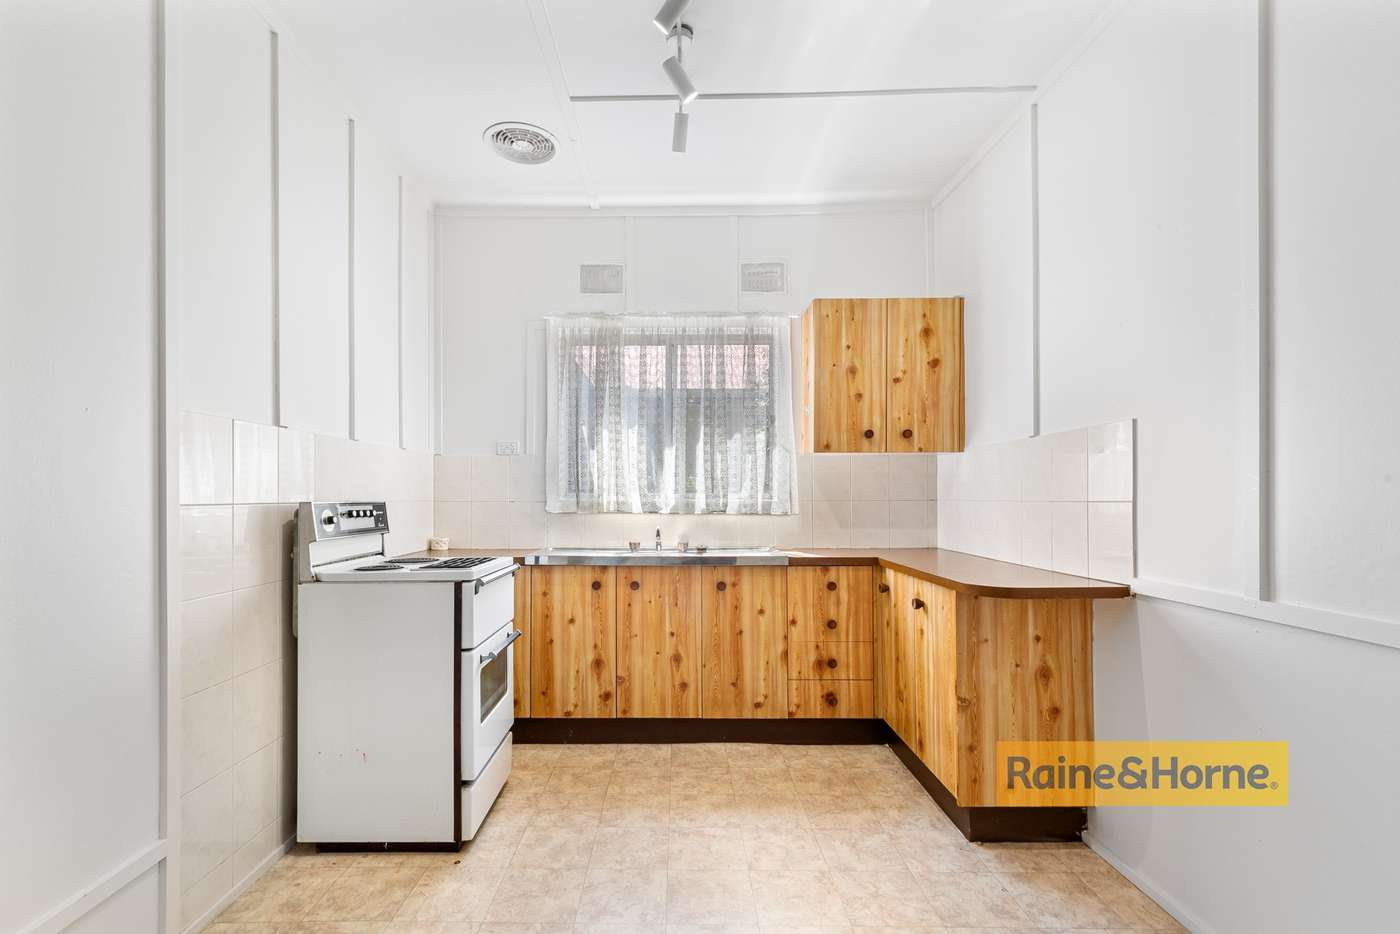 Main view of Homely unit listing, 1/64 Karingi Street, Ettalong Beach NSW 2257